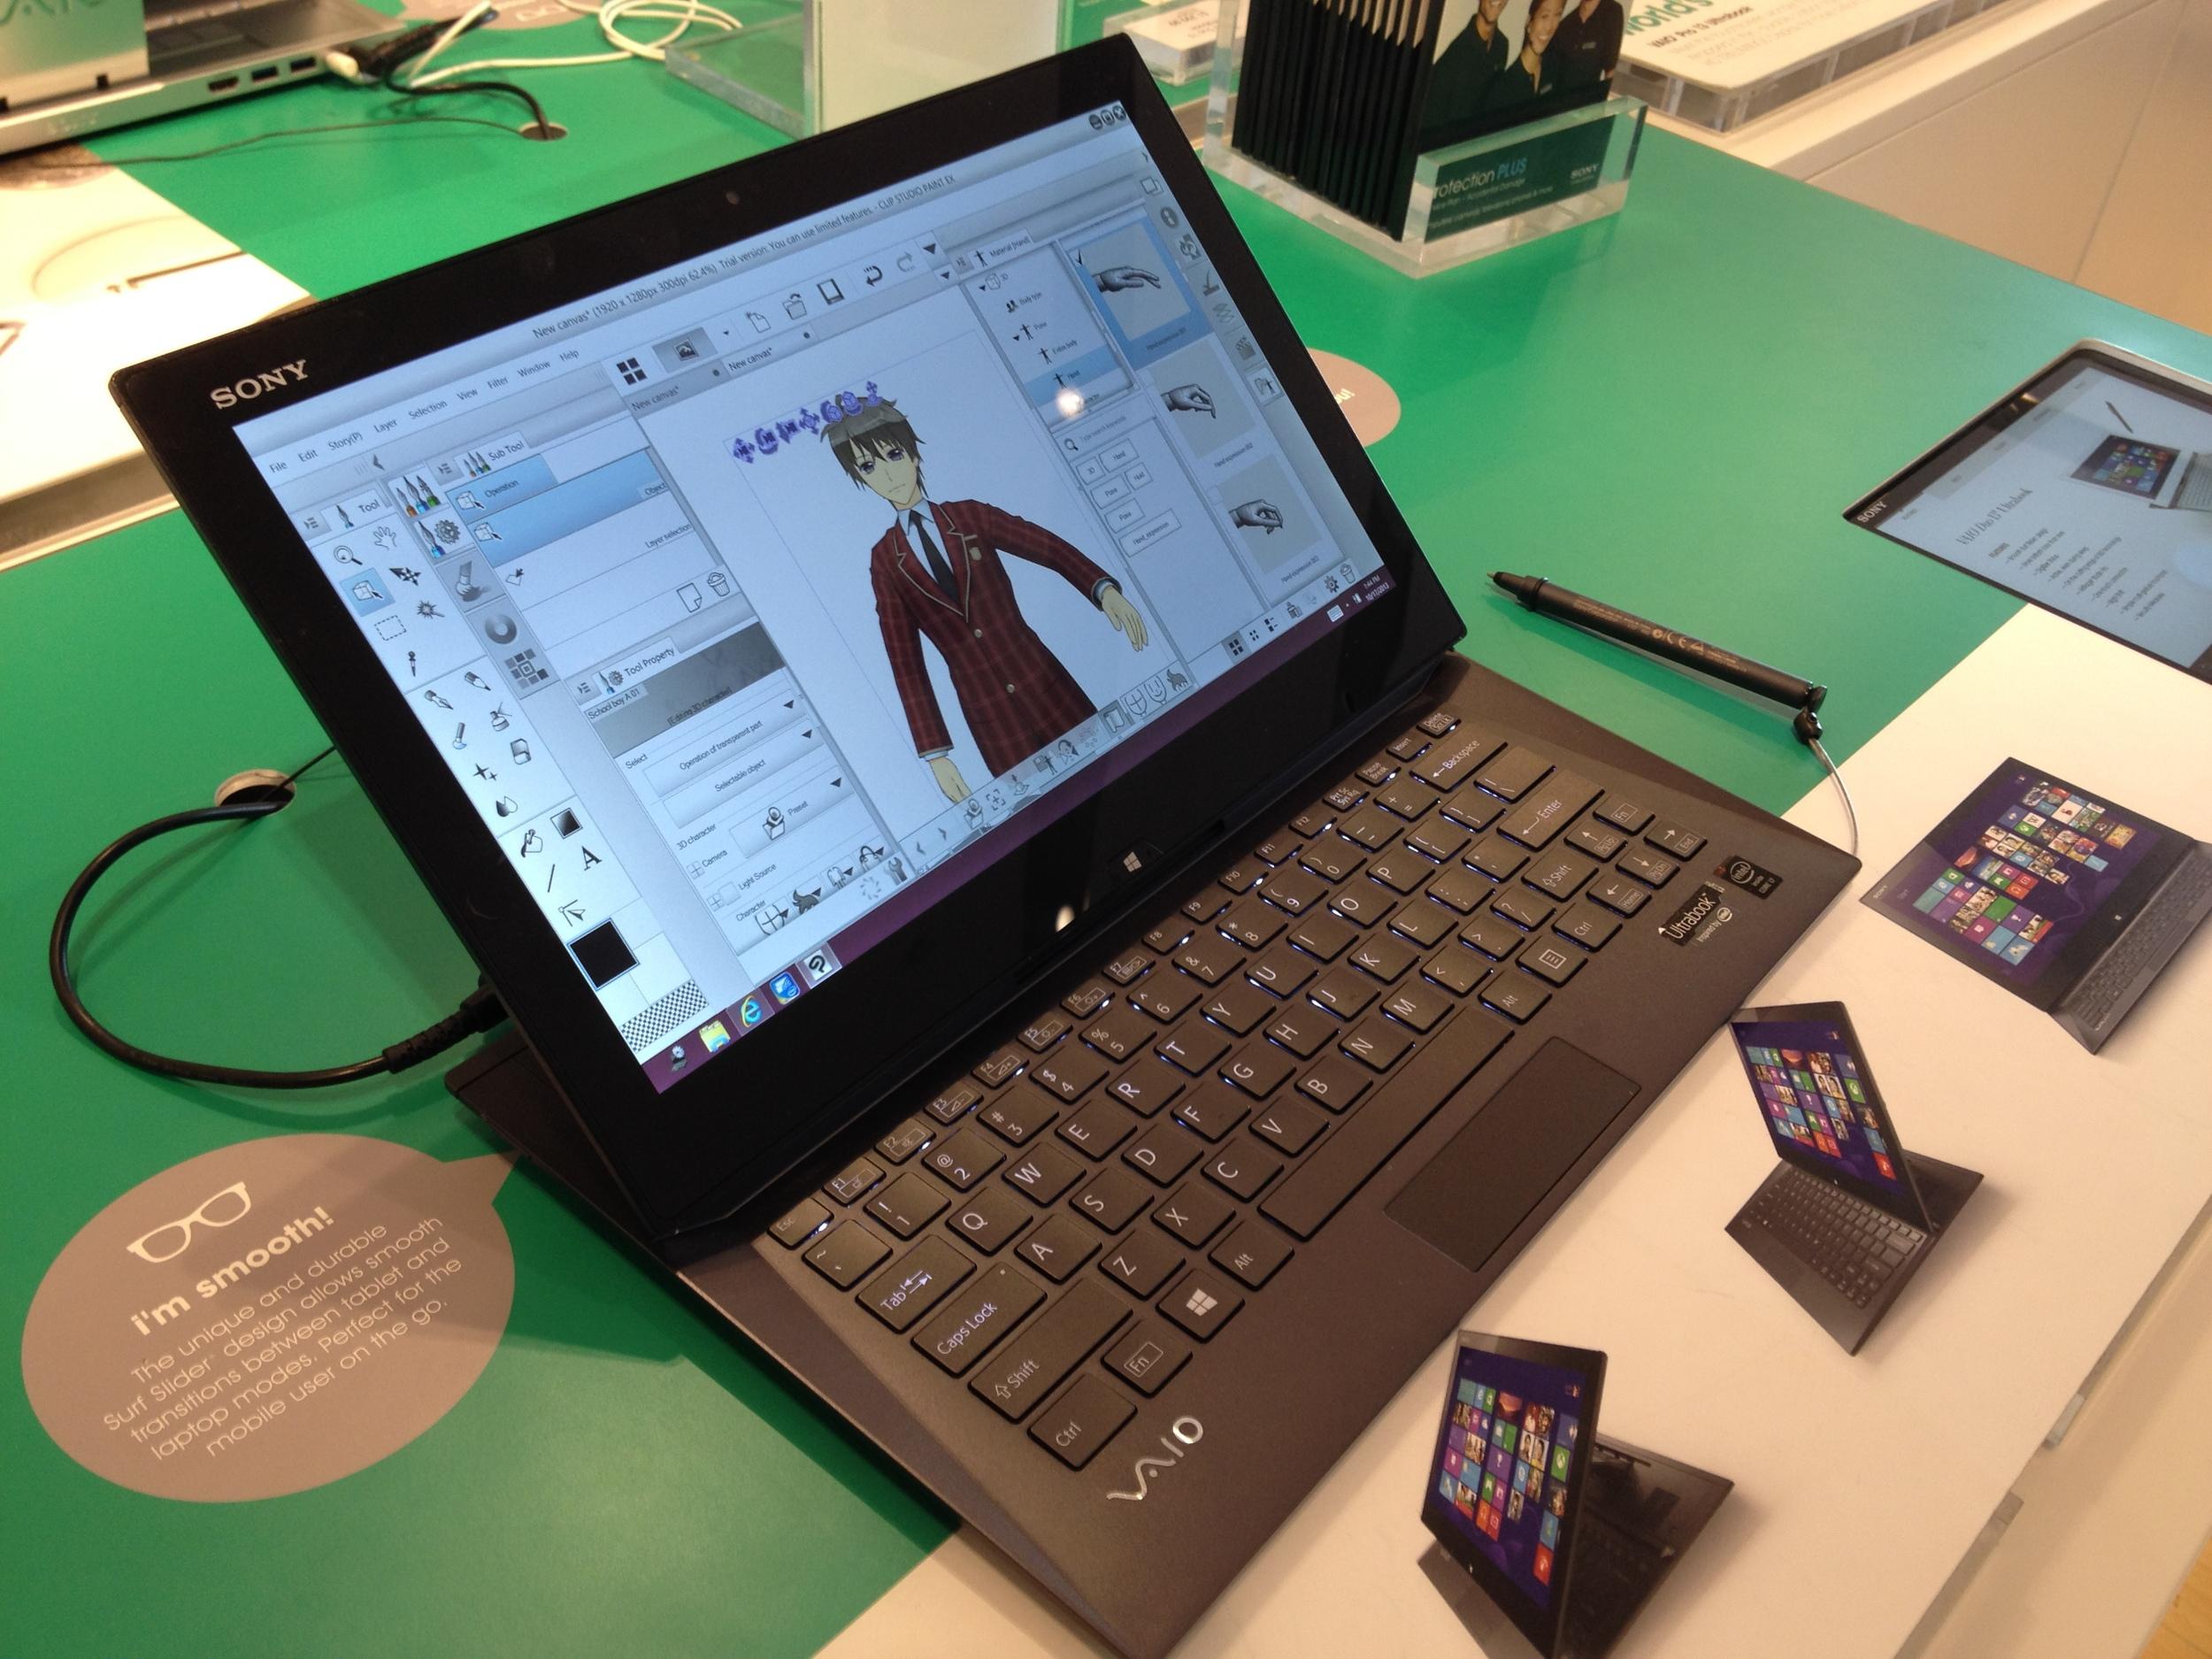 Sony VAIO Duo 13 running Clip Studio Paint 1.2.7. Wacom digitizer isn't missed at all.